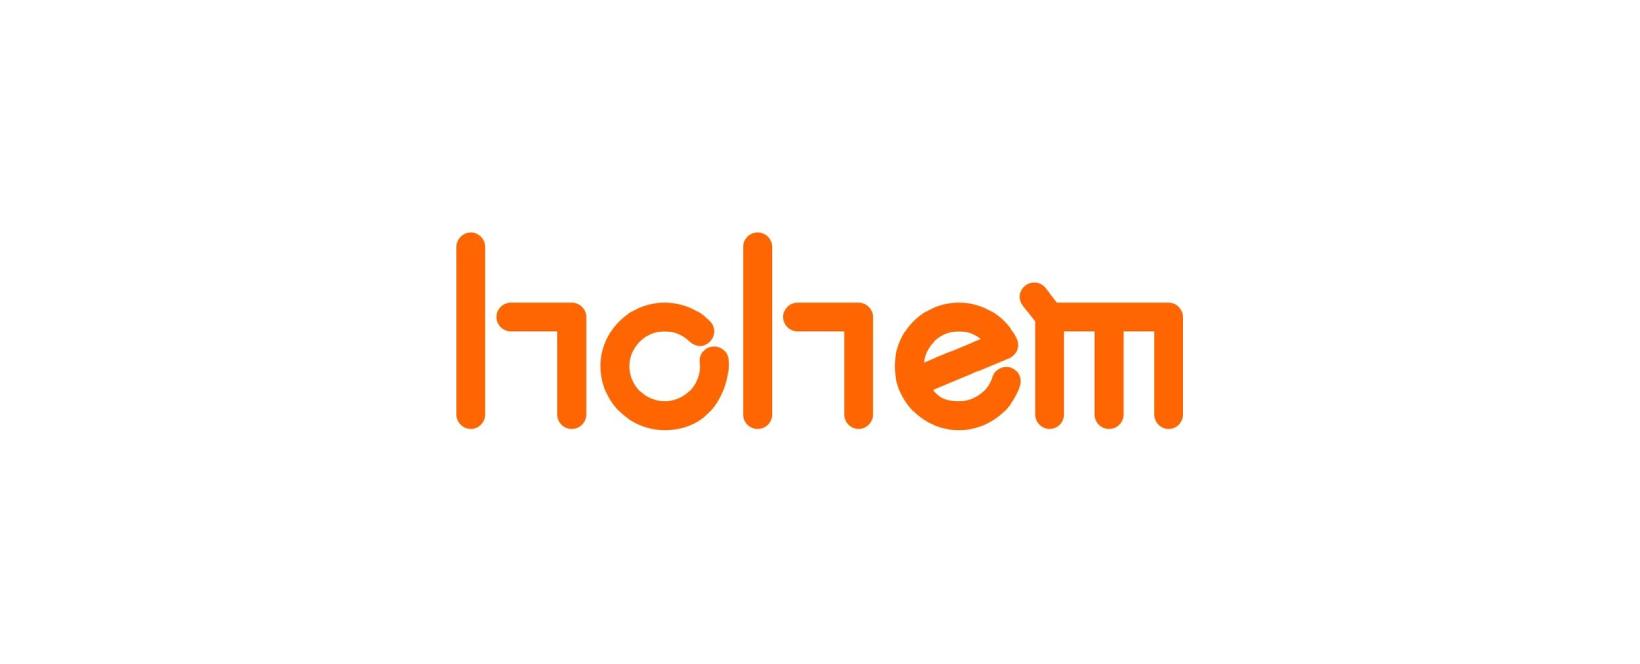 Hohem Discount Code 2021